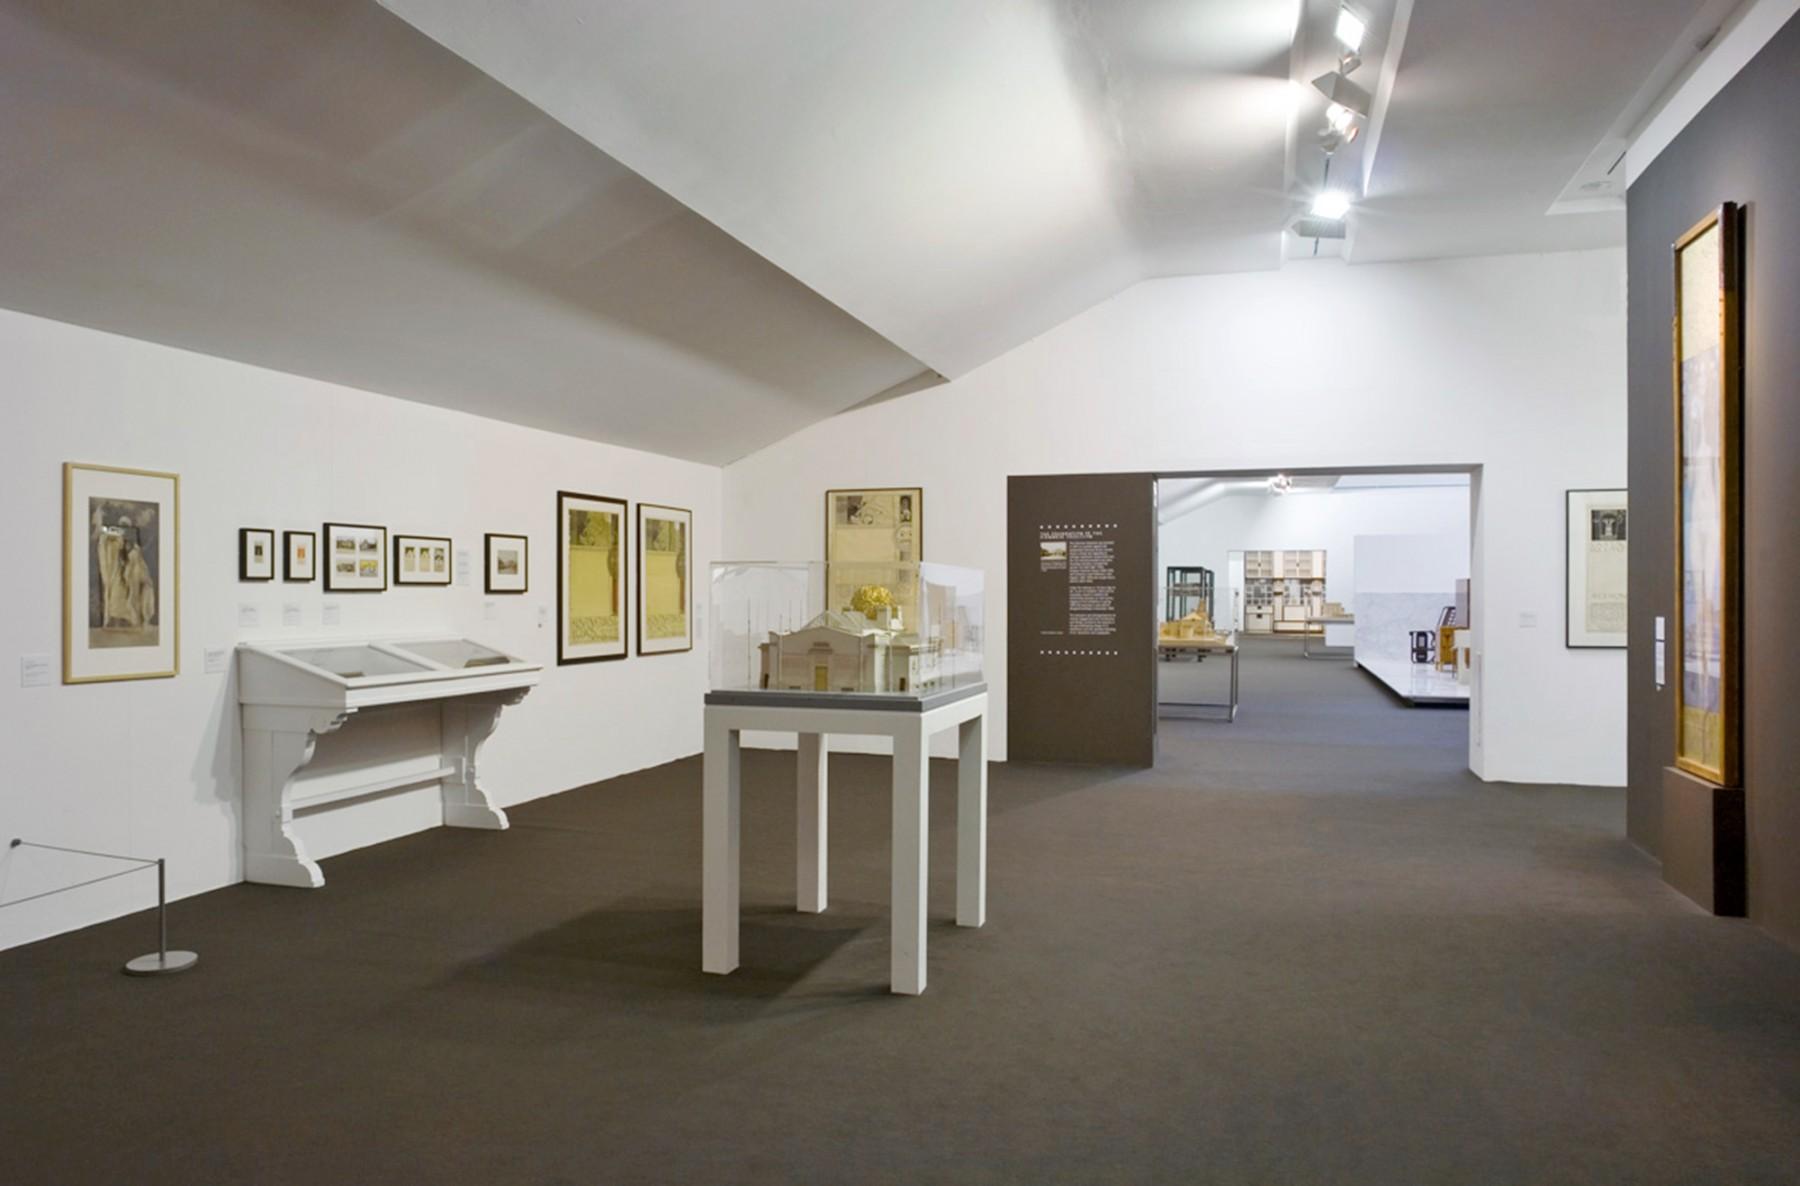 Gustav-Klimt-Painting-Design-Modern-Life-Vienna-Secession-Tate-Liverpool-art-exhibition-gallery-Jamie-Fobert-Architects-1